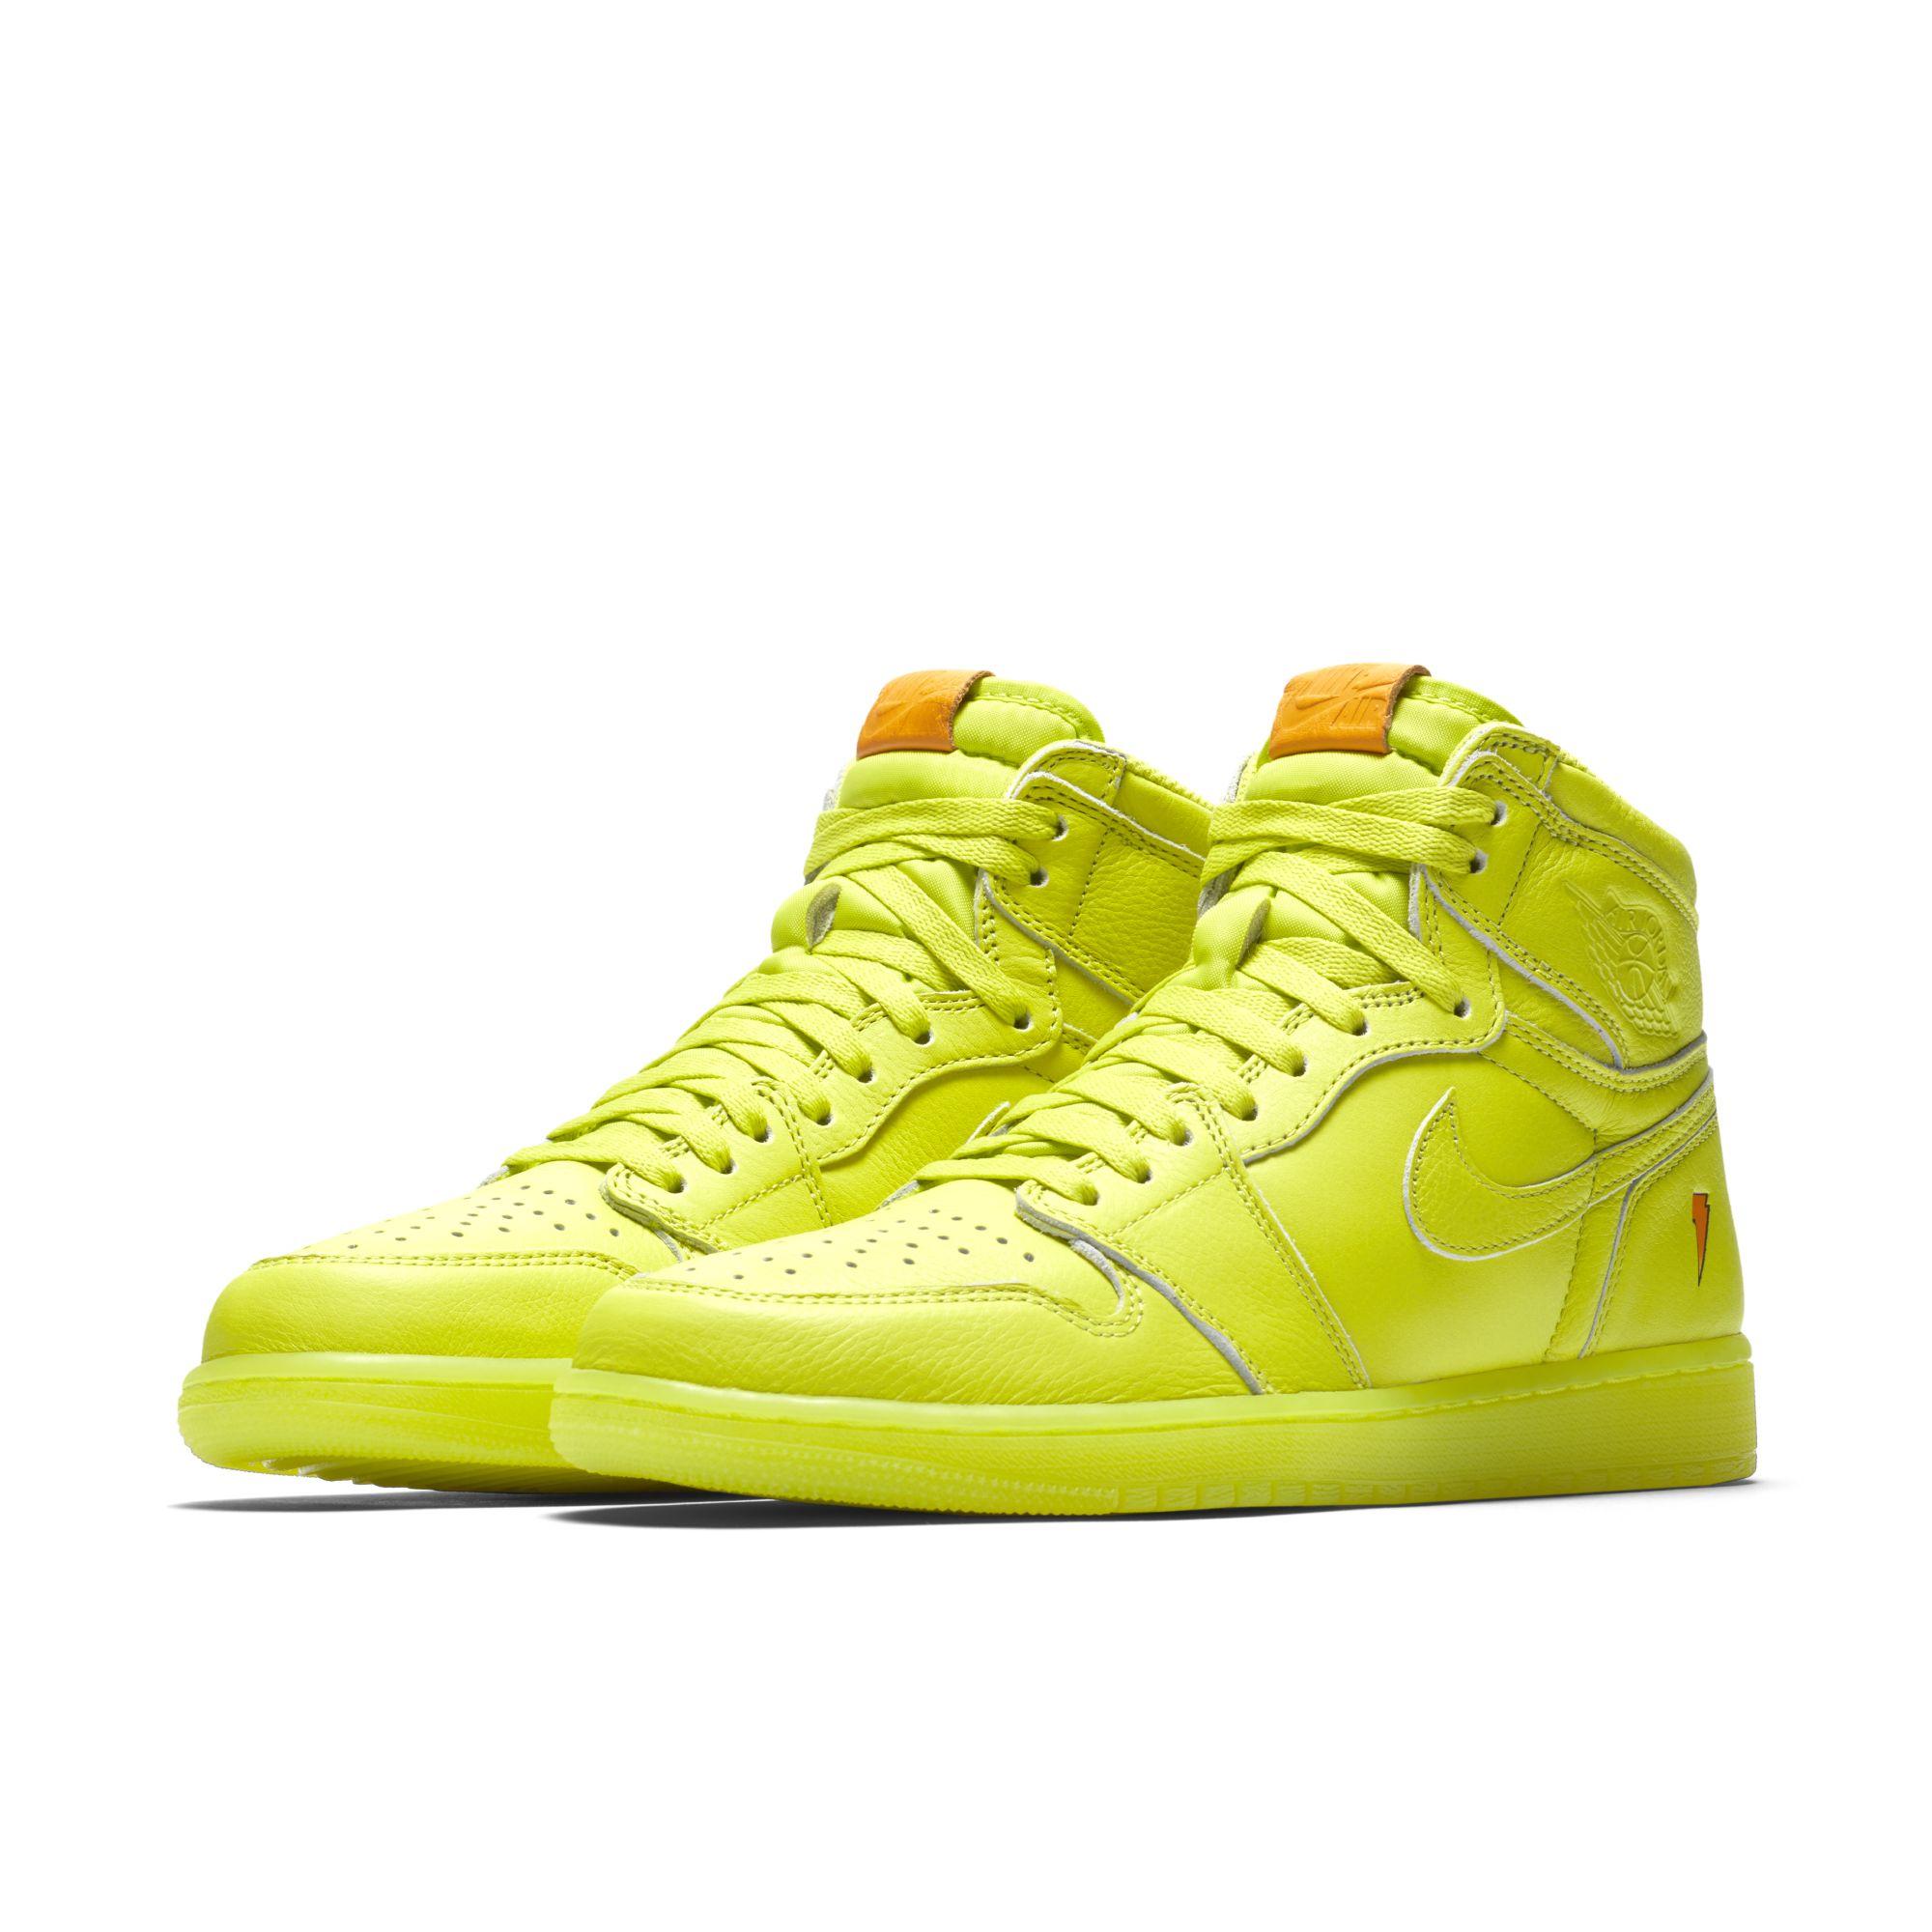 release date: 988d2 c2234 The Gatorade x Air Jordan 1 Retro High Goes Lemon-Lime ...